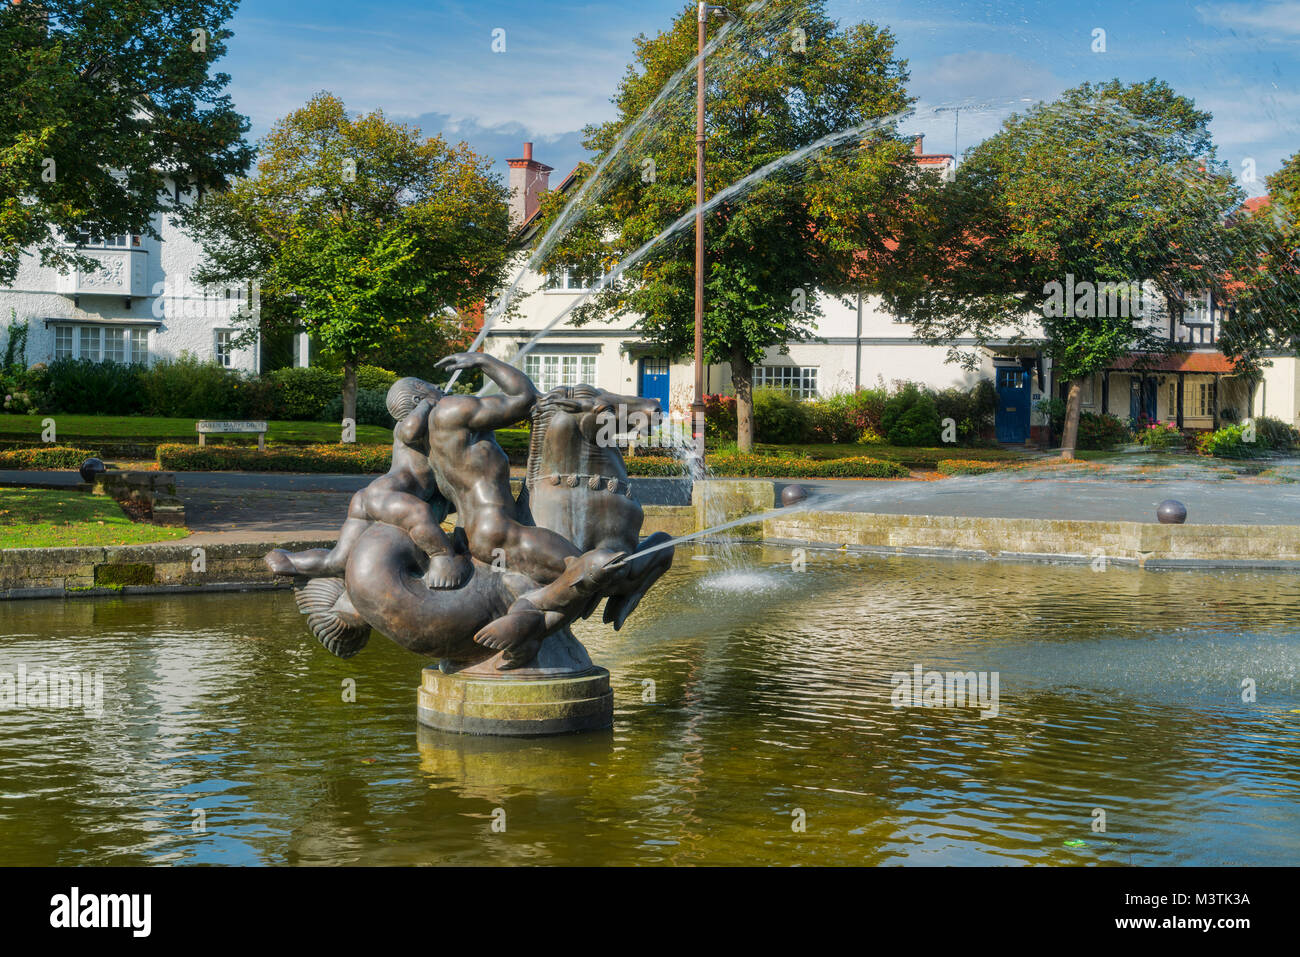 Fountain, Port Sunlight, Bebington, Wirral, Merseyside, UK - Stock Image